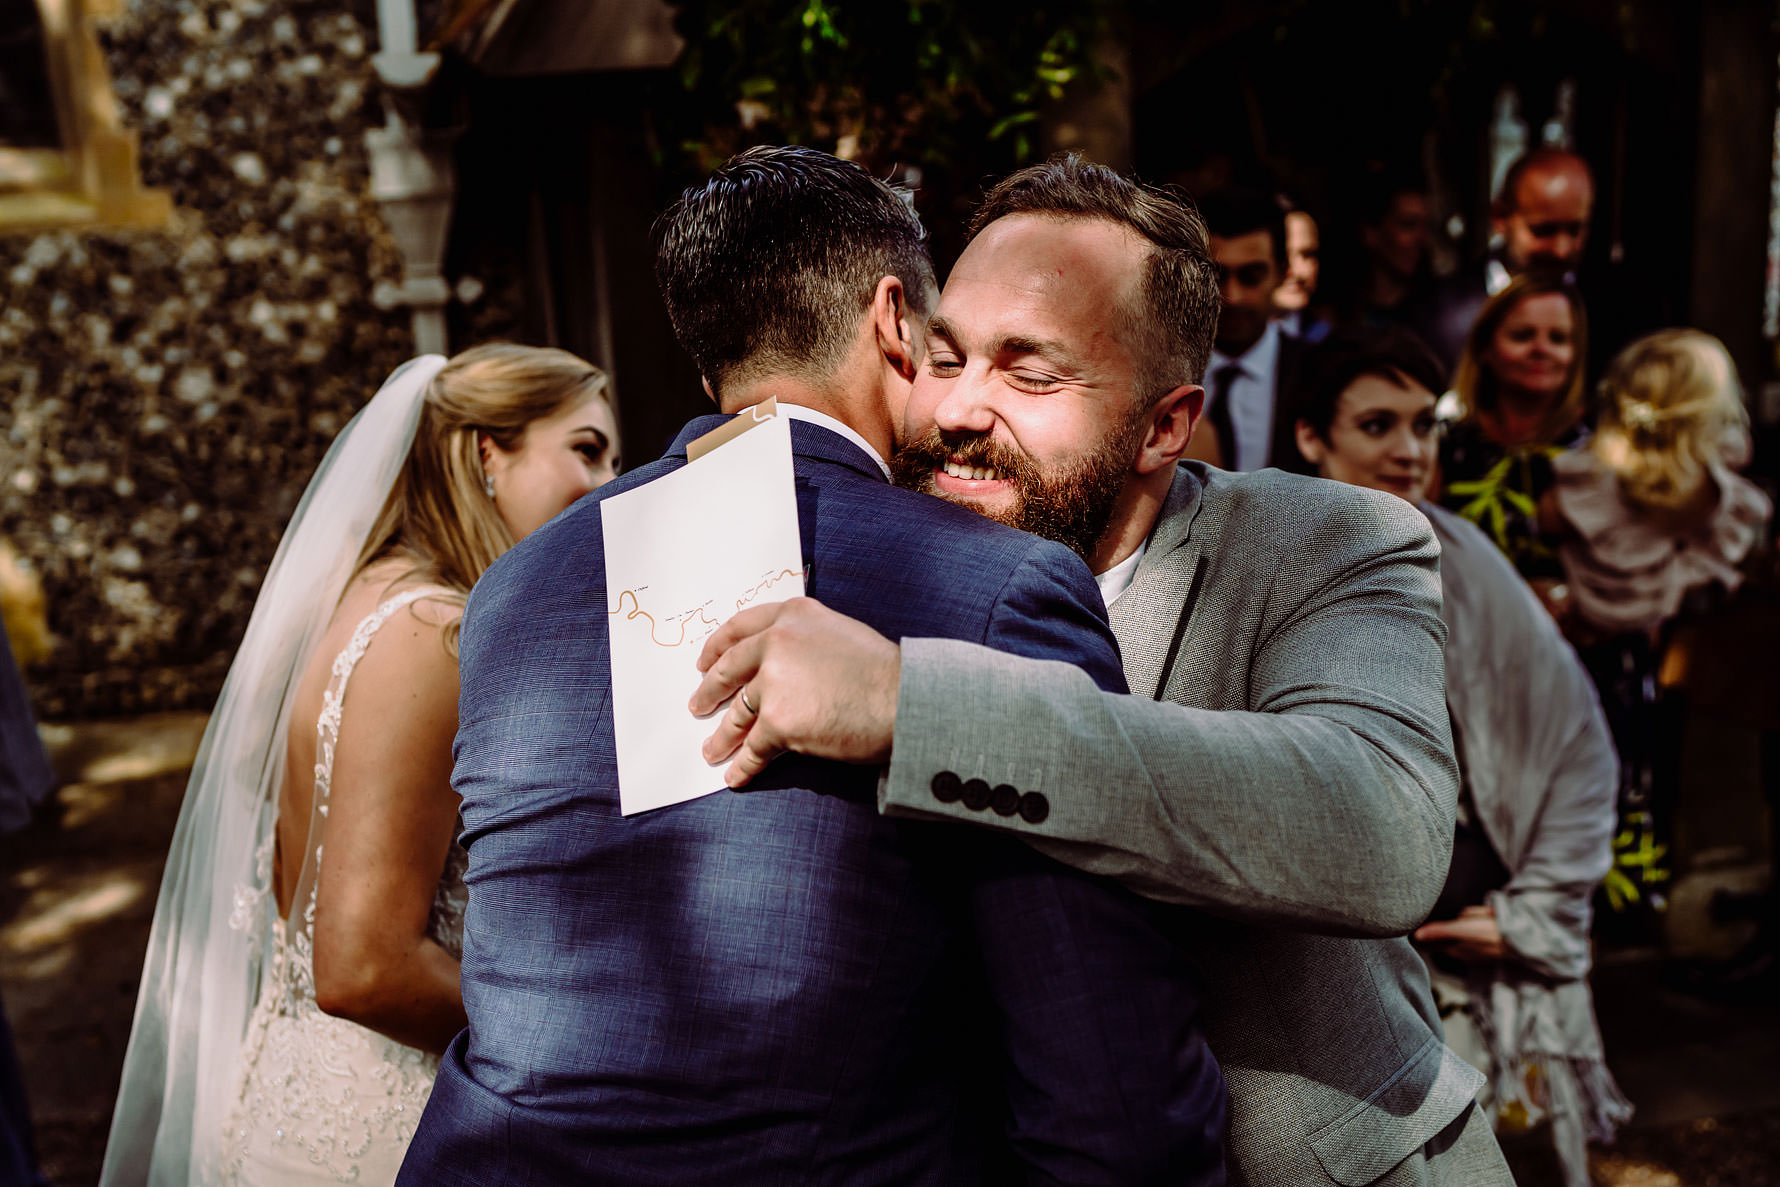 a gent congratulates the groom